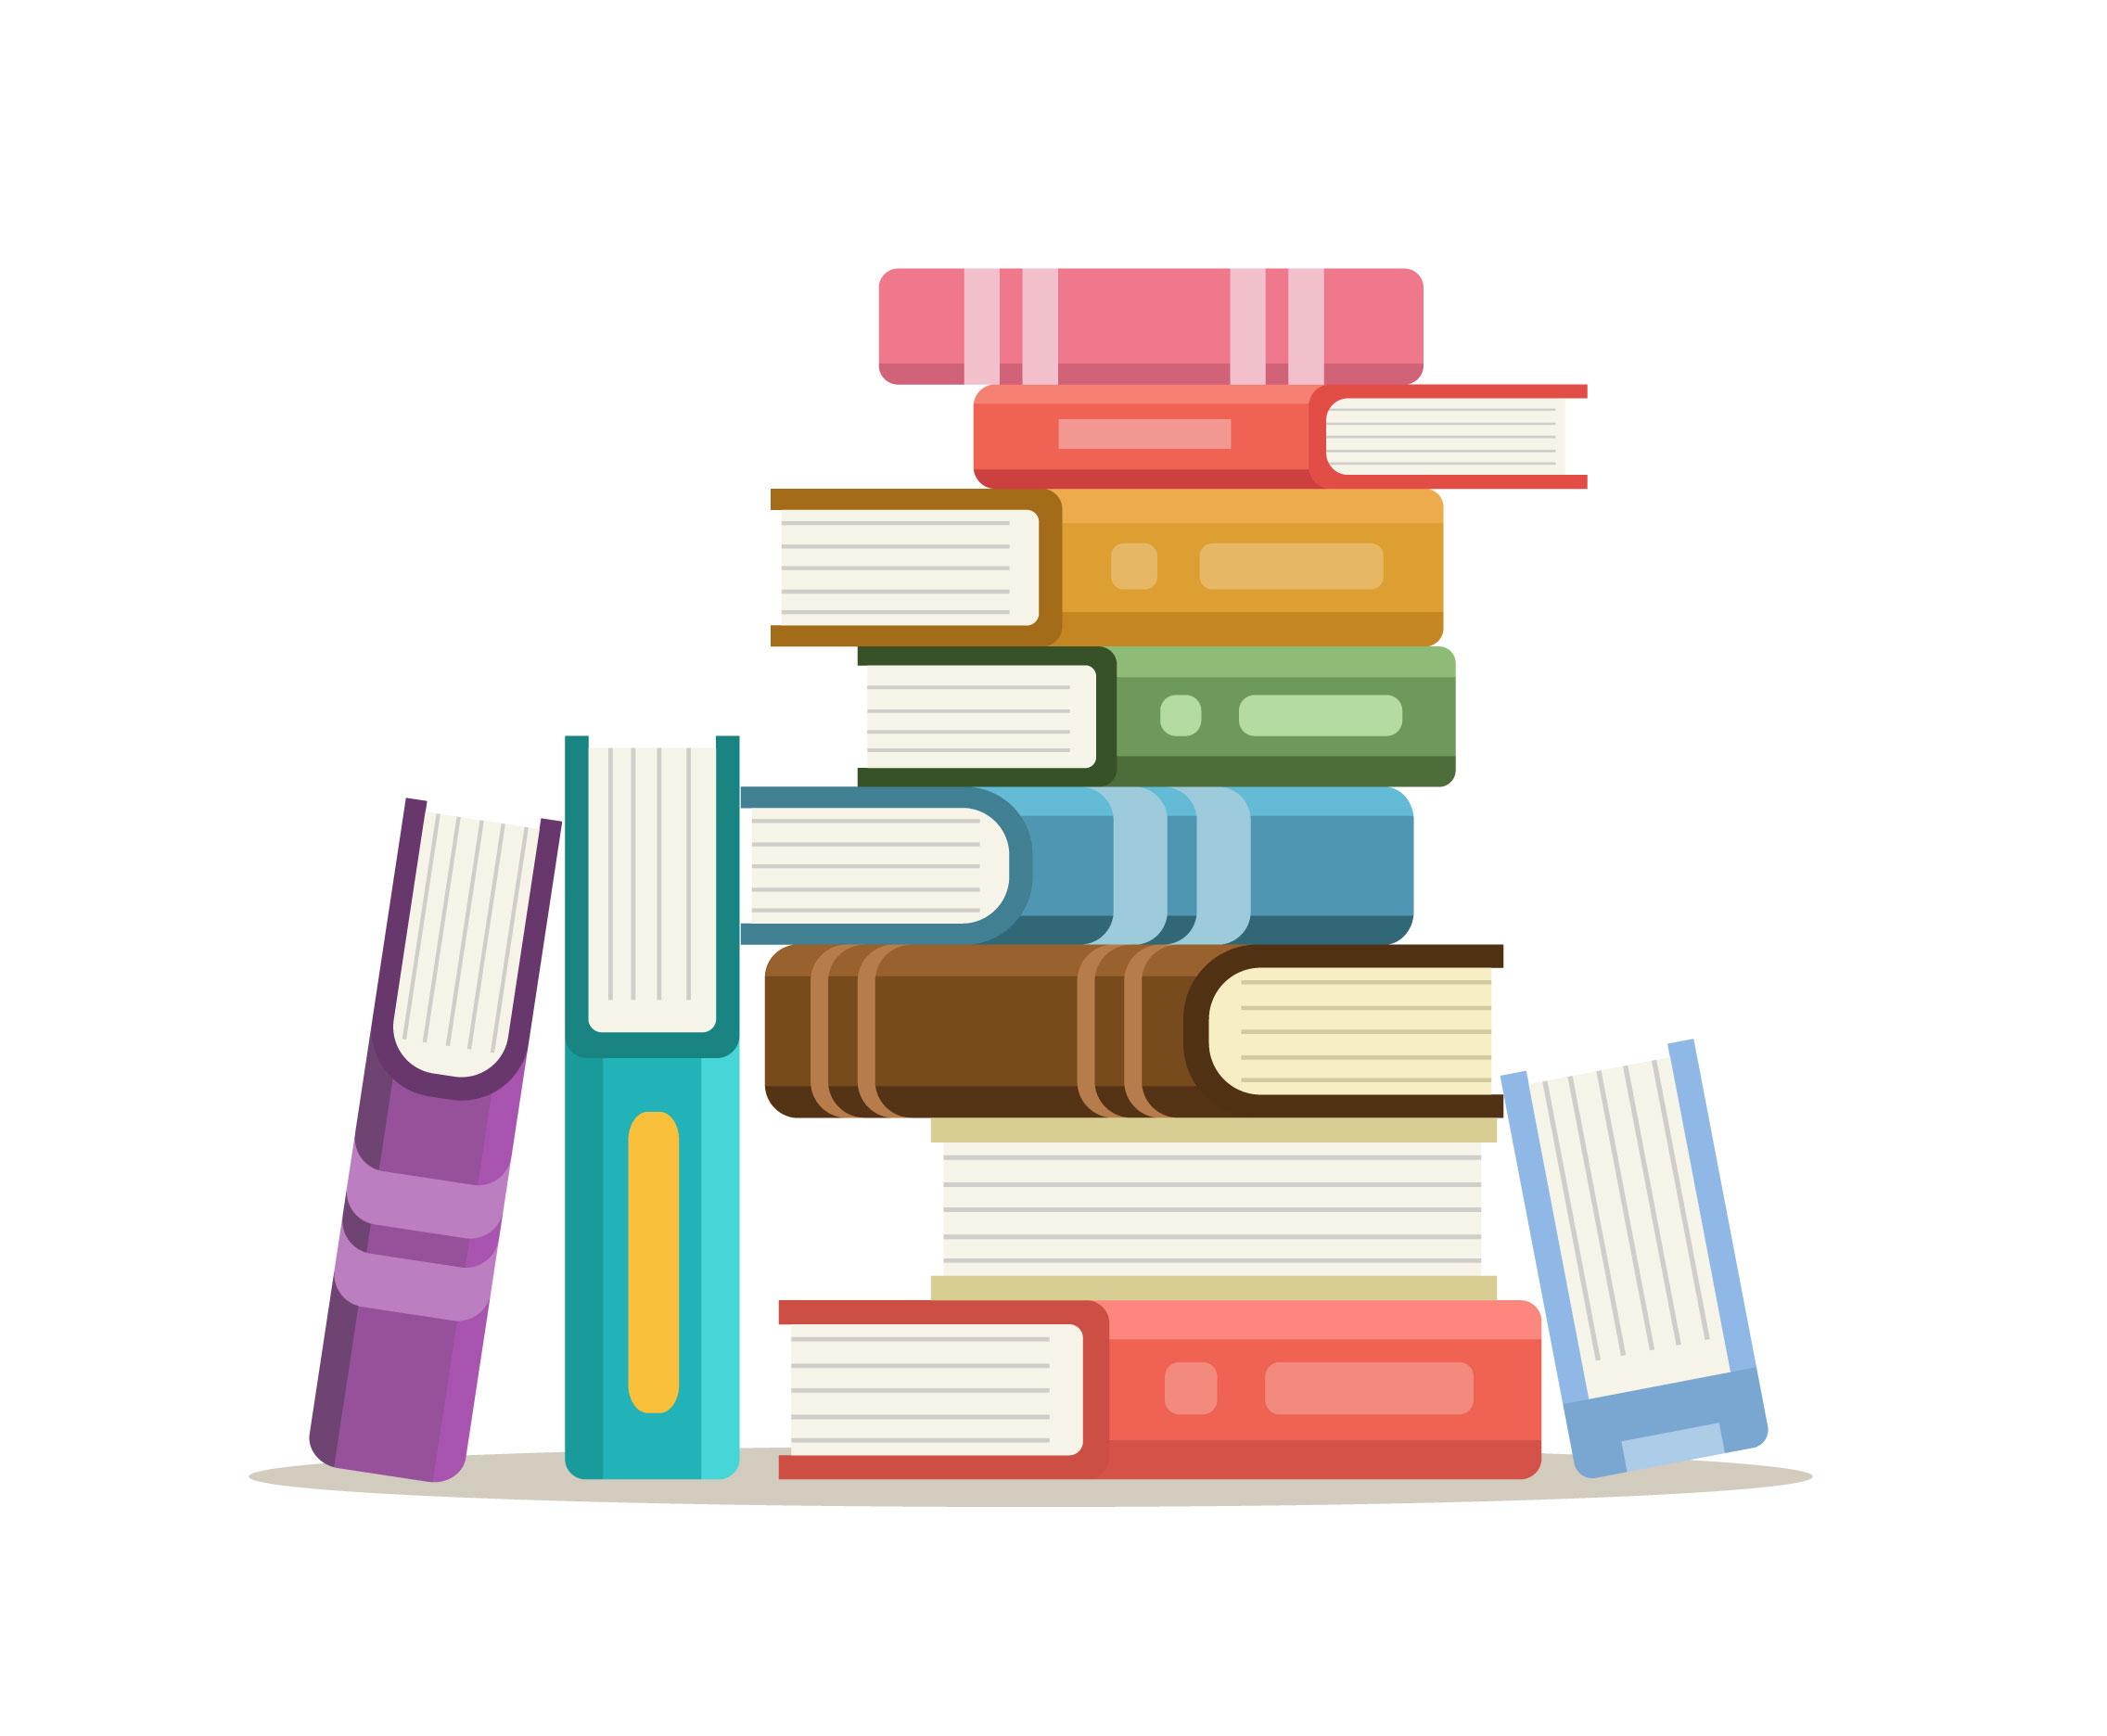 http://www.mml-learners.com/school/news/Stack-of-Books-Clipart.jpg